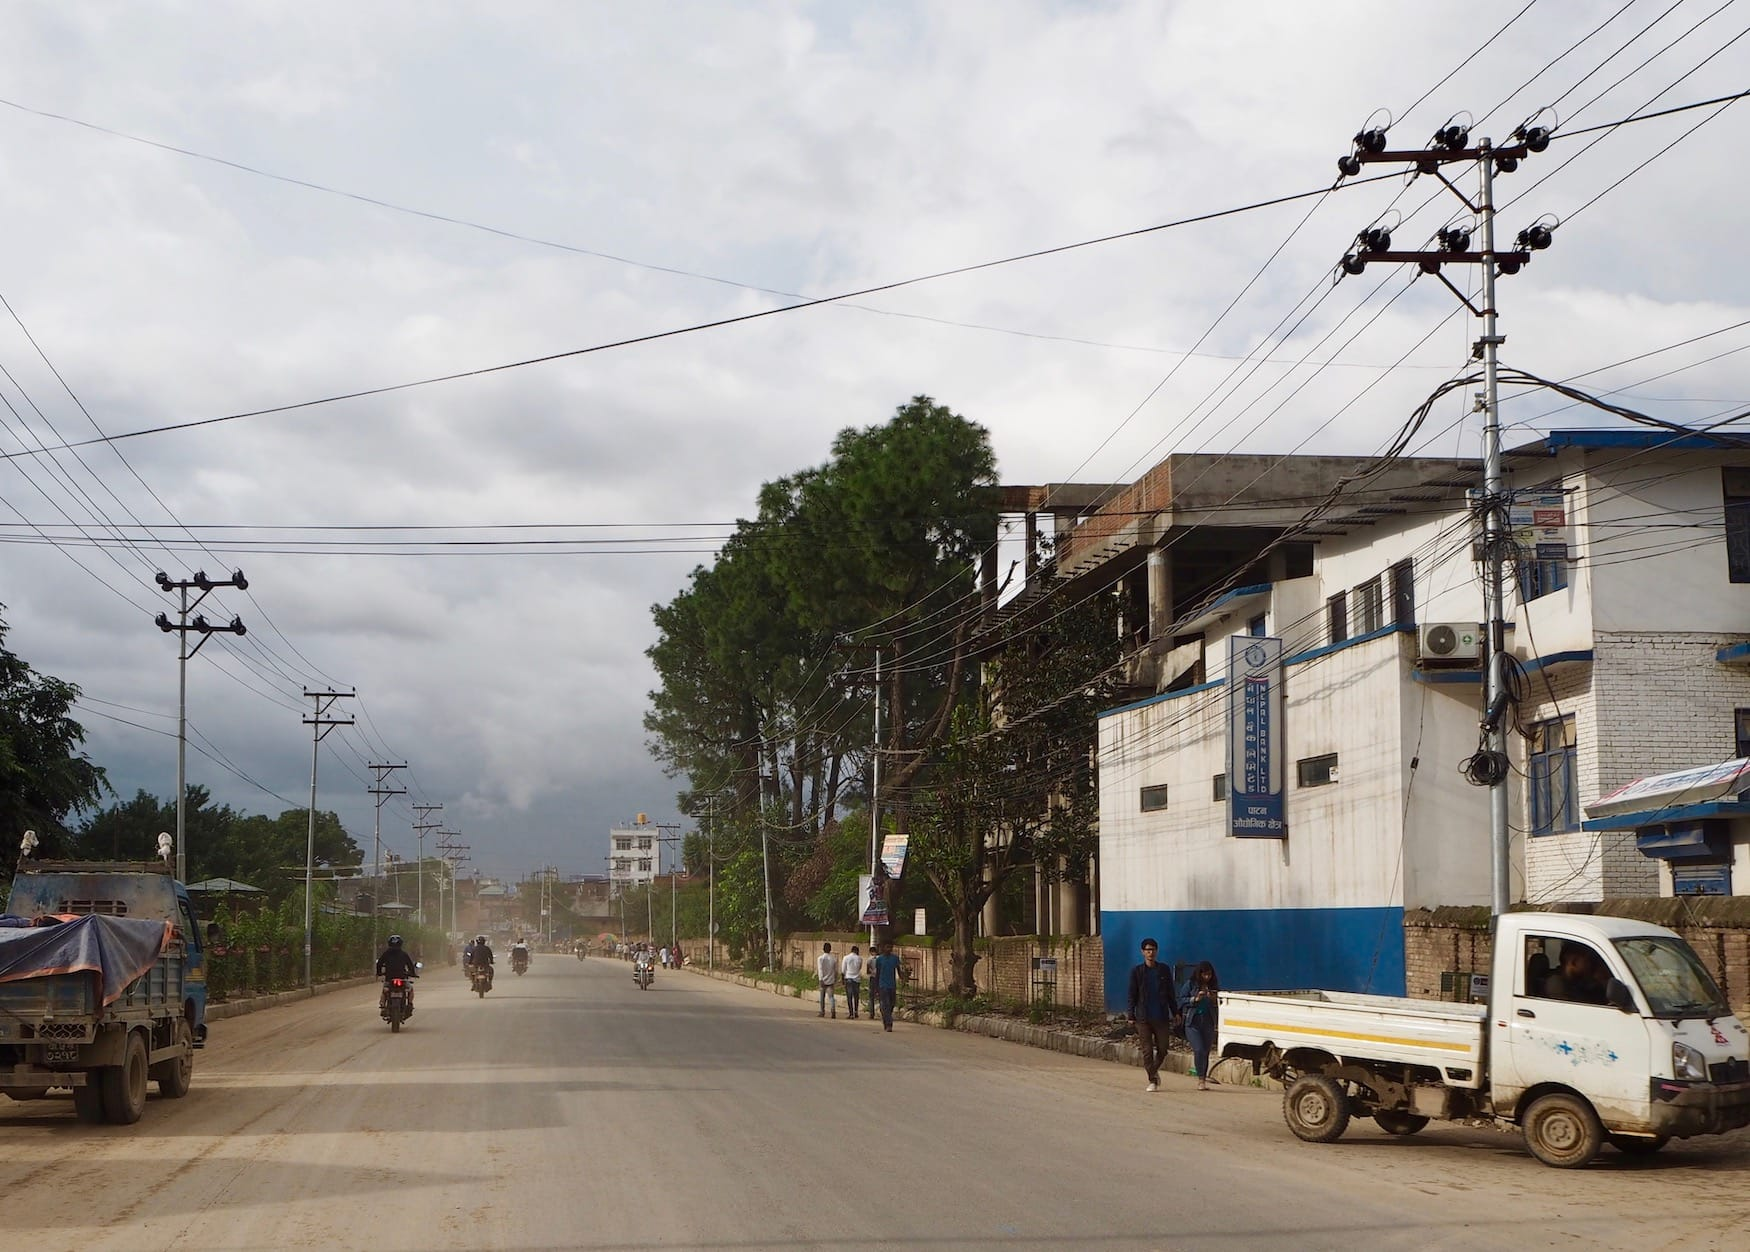 Staubige Straße in Kathmandu, Nepal